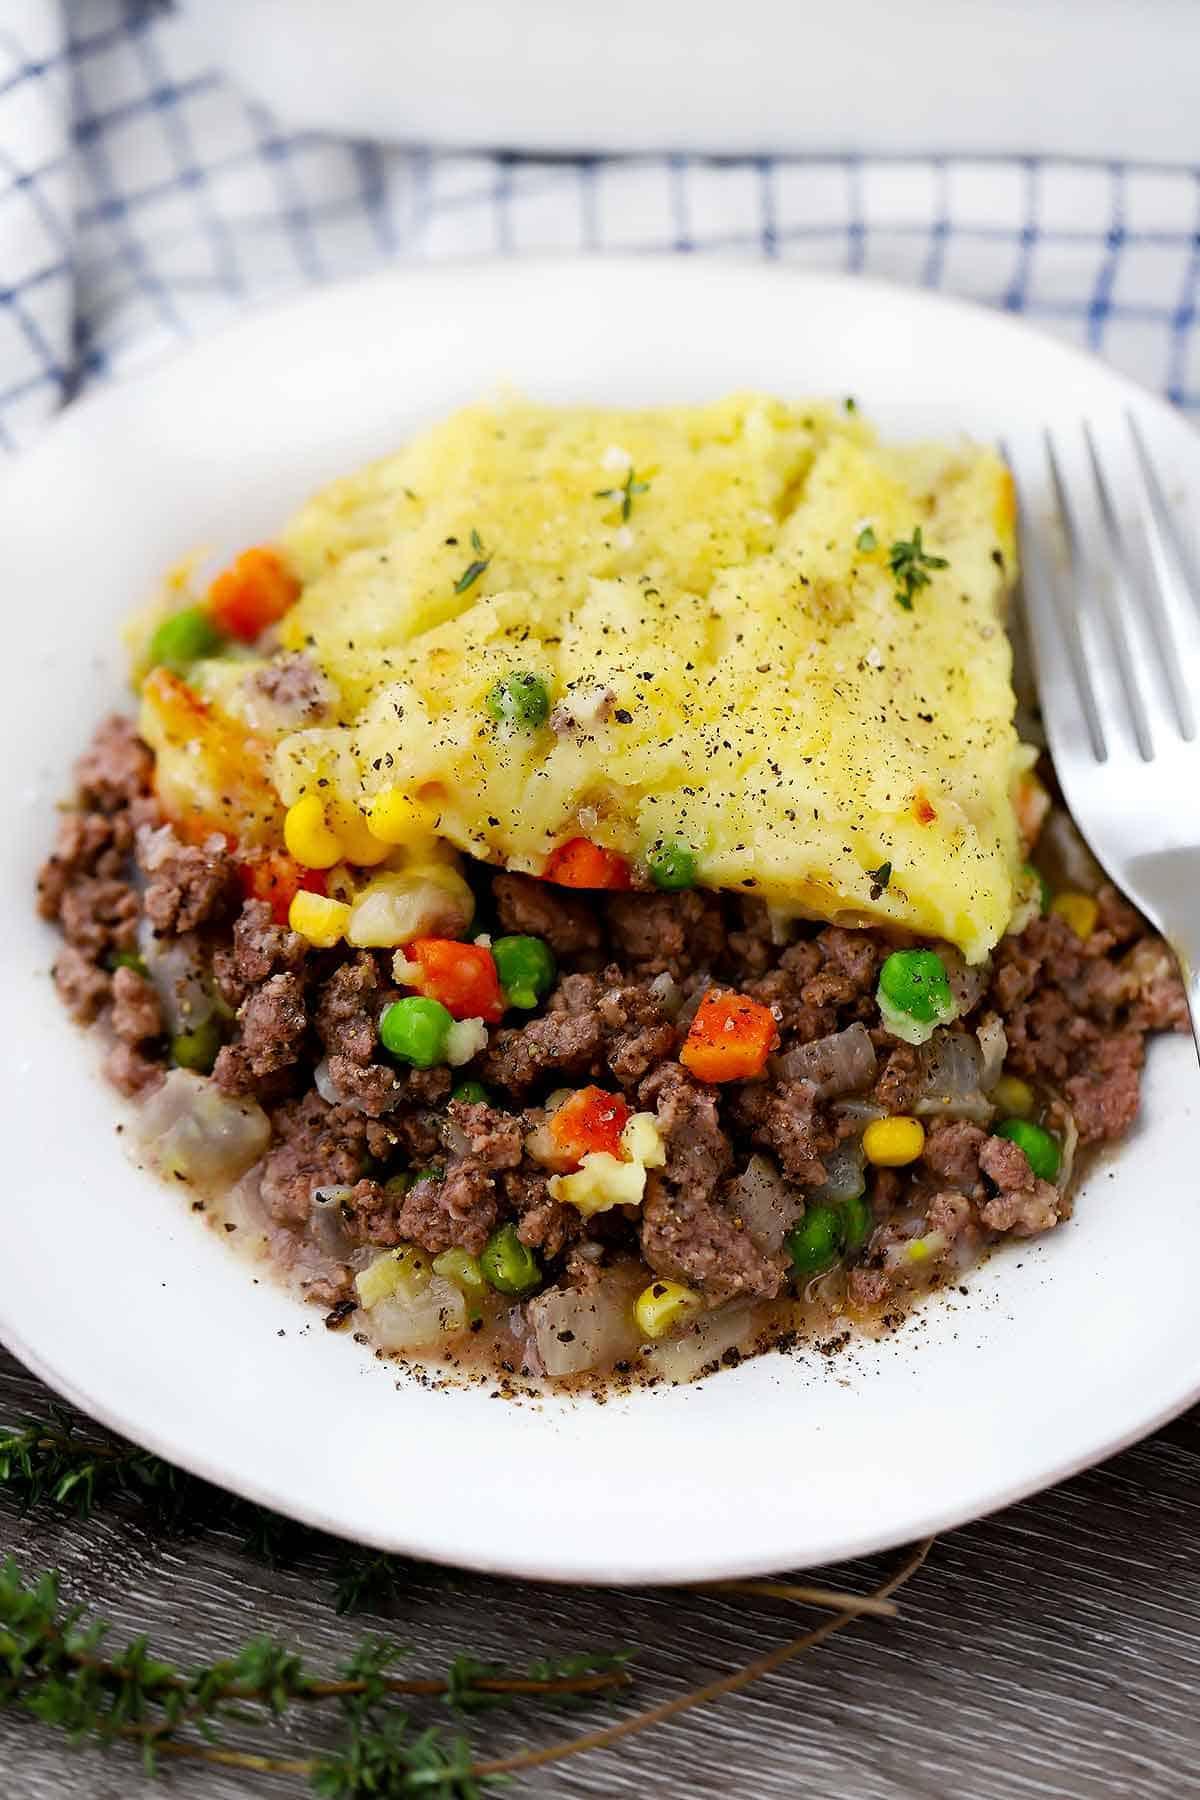 Easy Shepherd S Pie 6 Ingredients Bowl Of Delicious